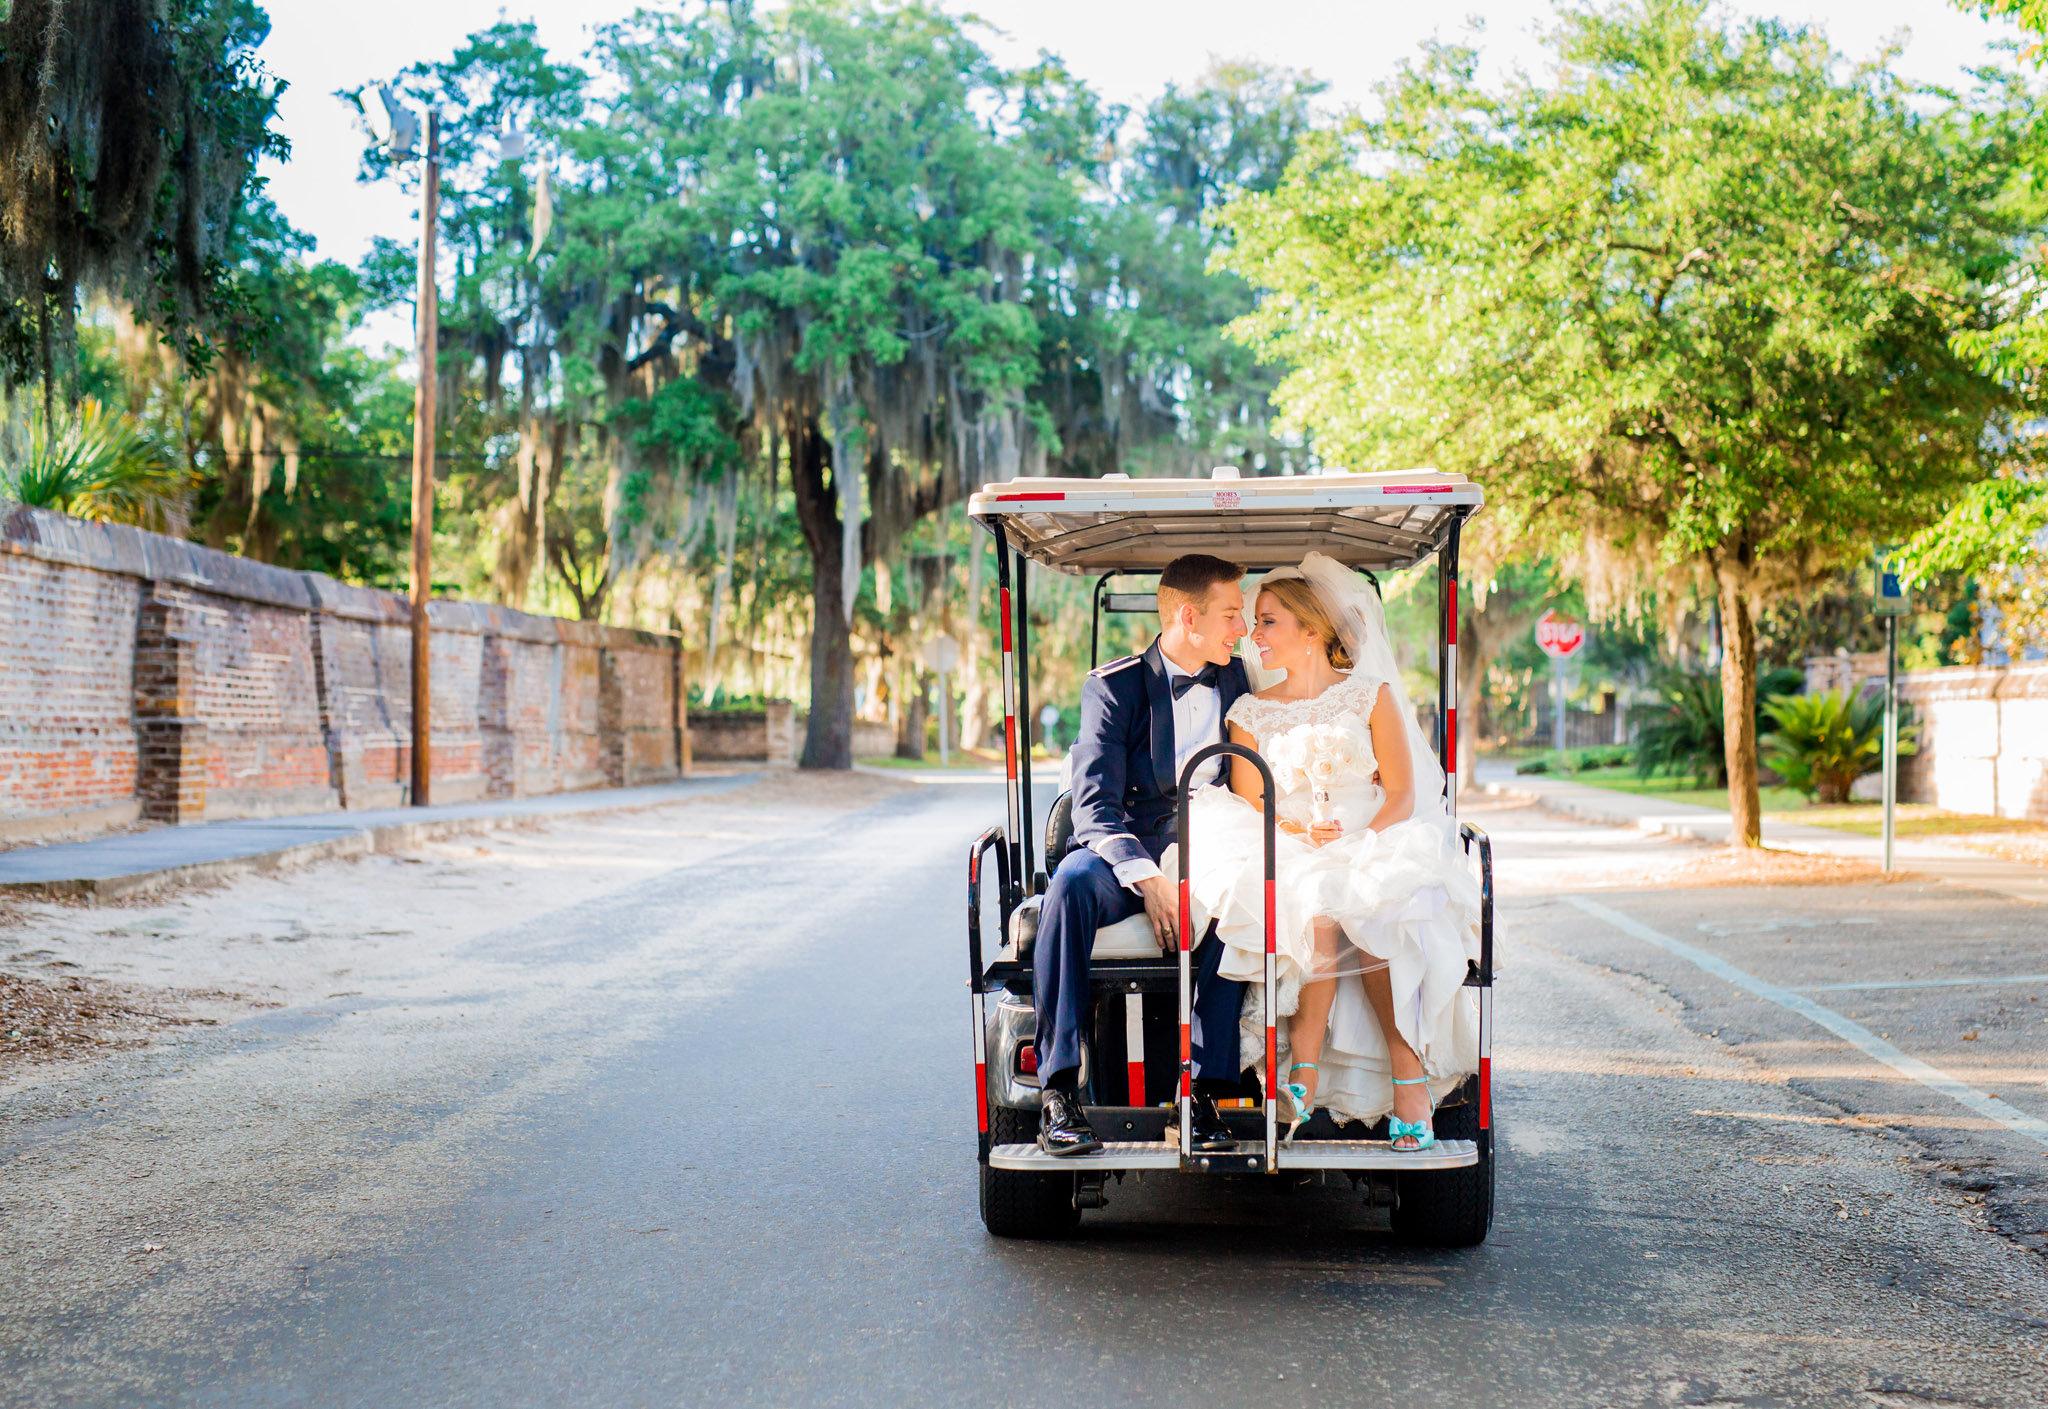 Bride & Groom's golf cart ride at Beaufort wedding